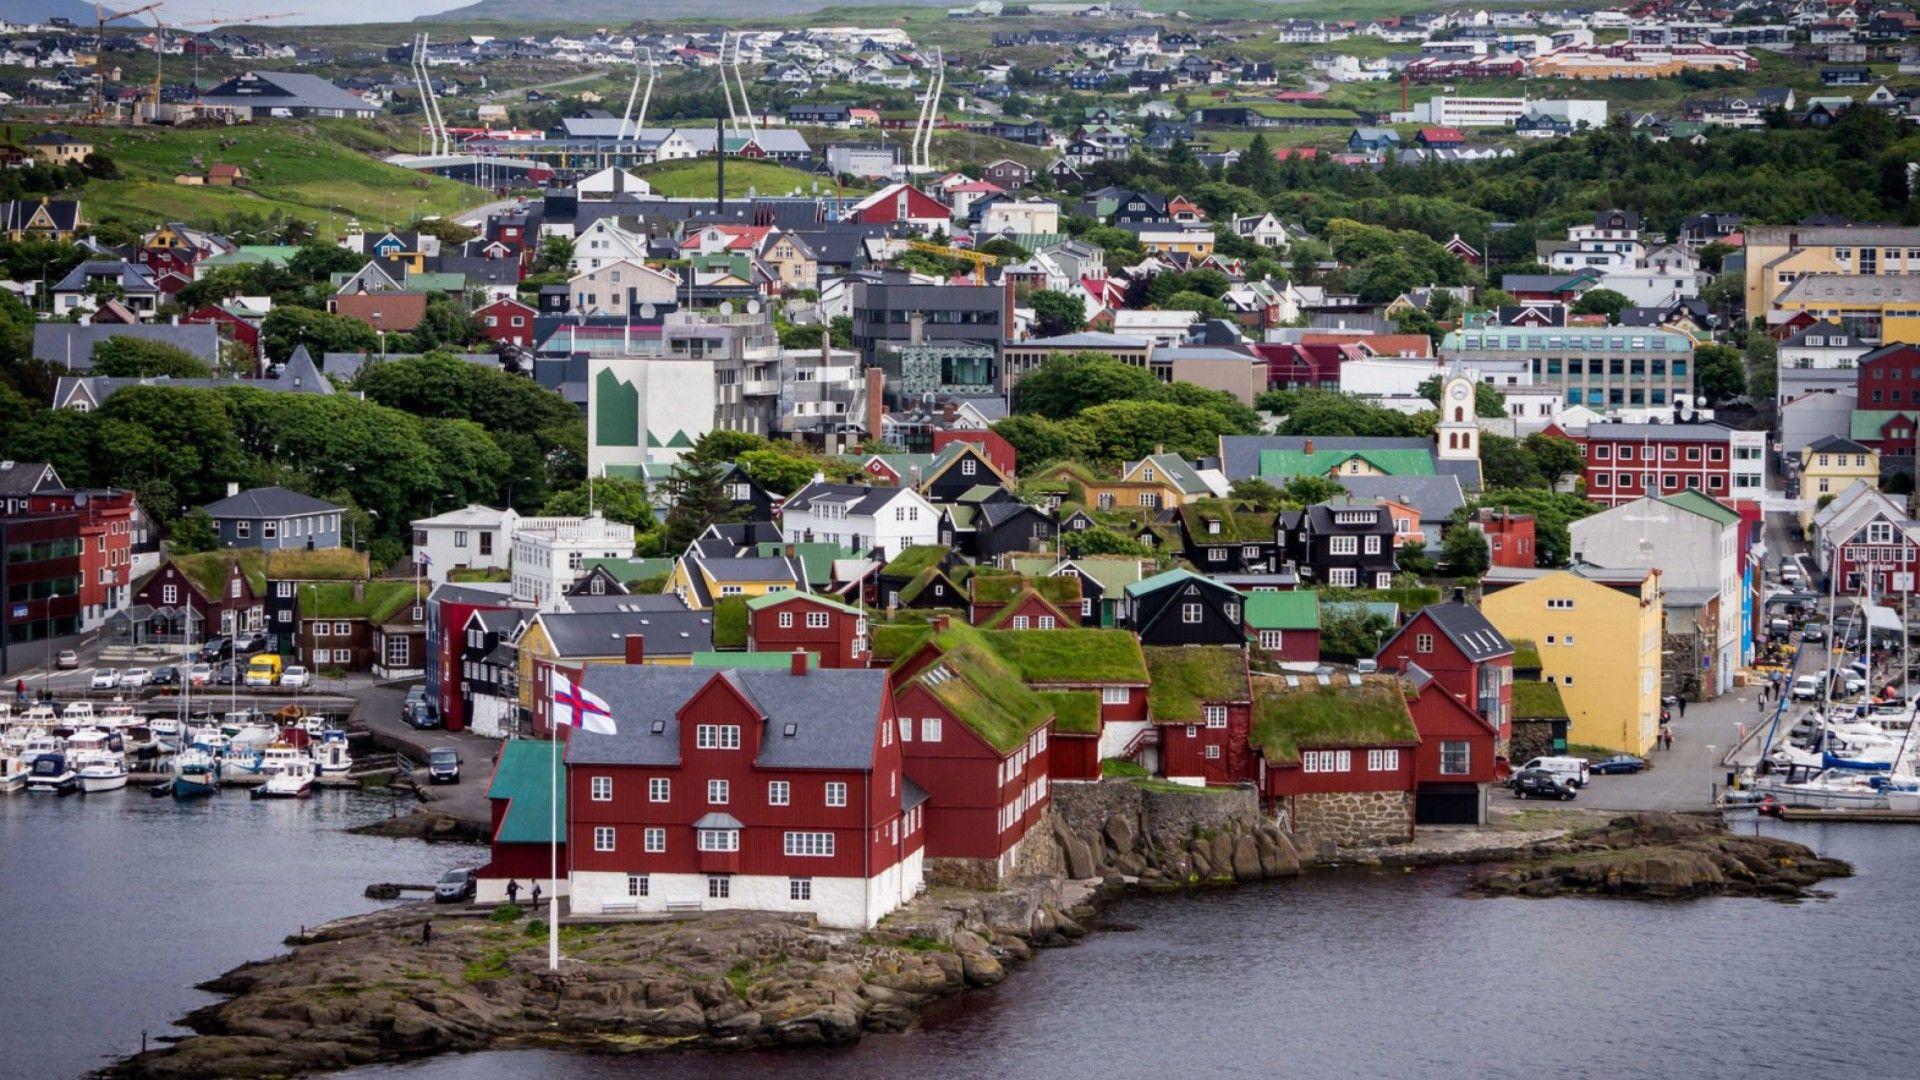 Houses Torshavn City Faroe Islands Marina Bay Boats Island